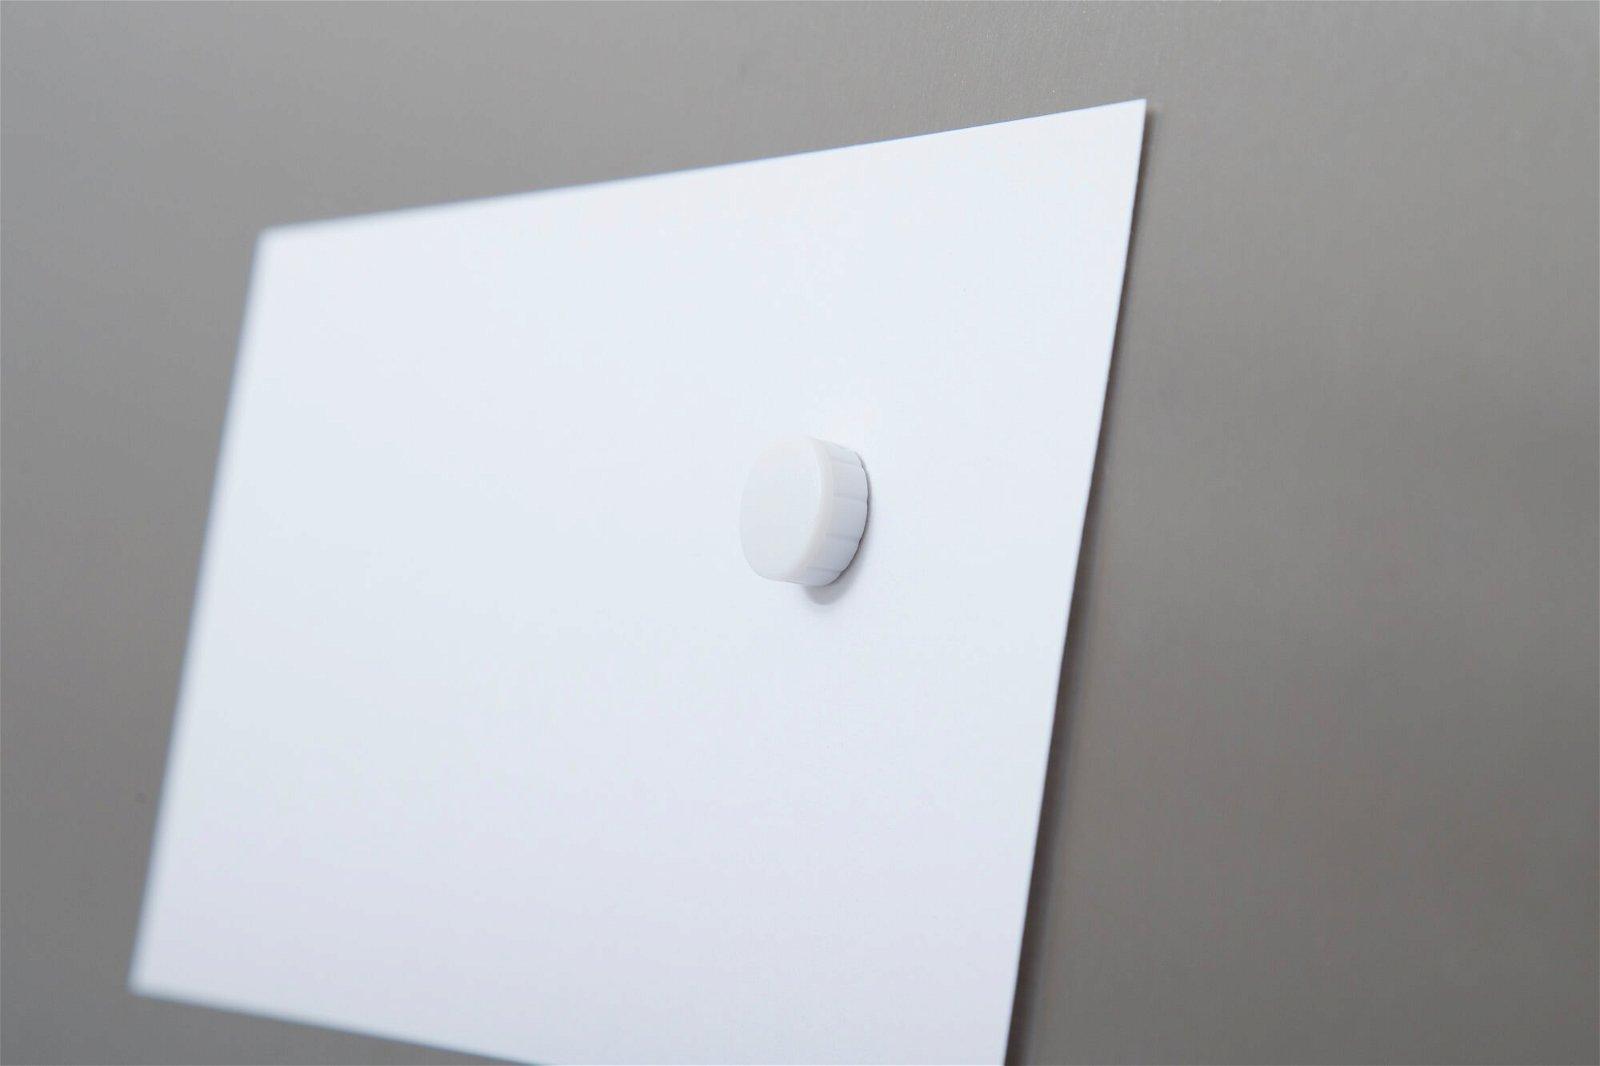 Magnet MAULsolid Ø 15 mm, 0,15 kg Haftkraft, 10 St/Ktn., weiß